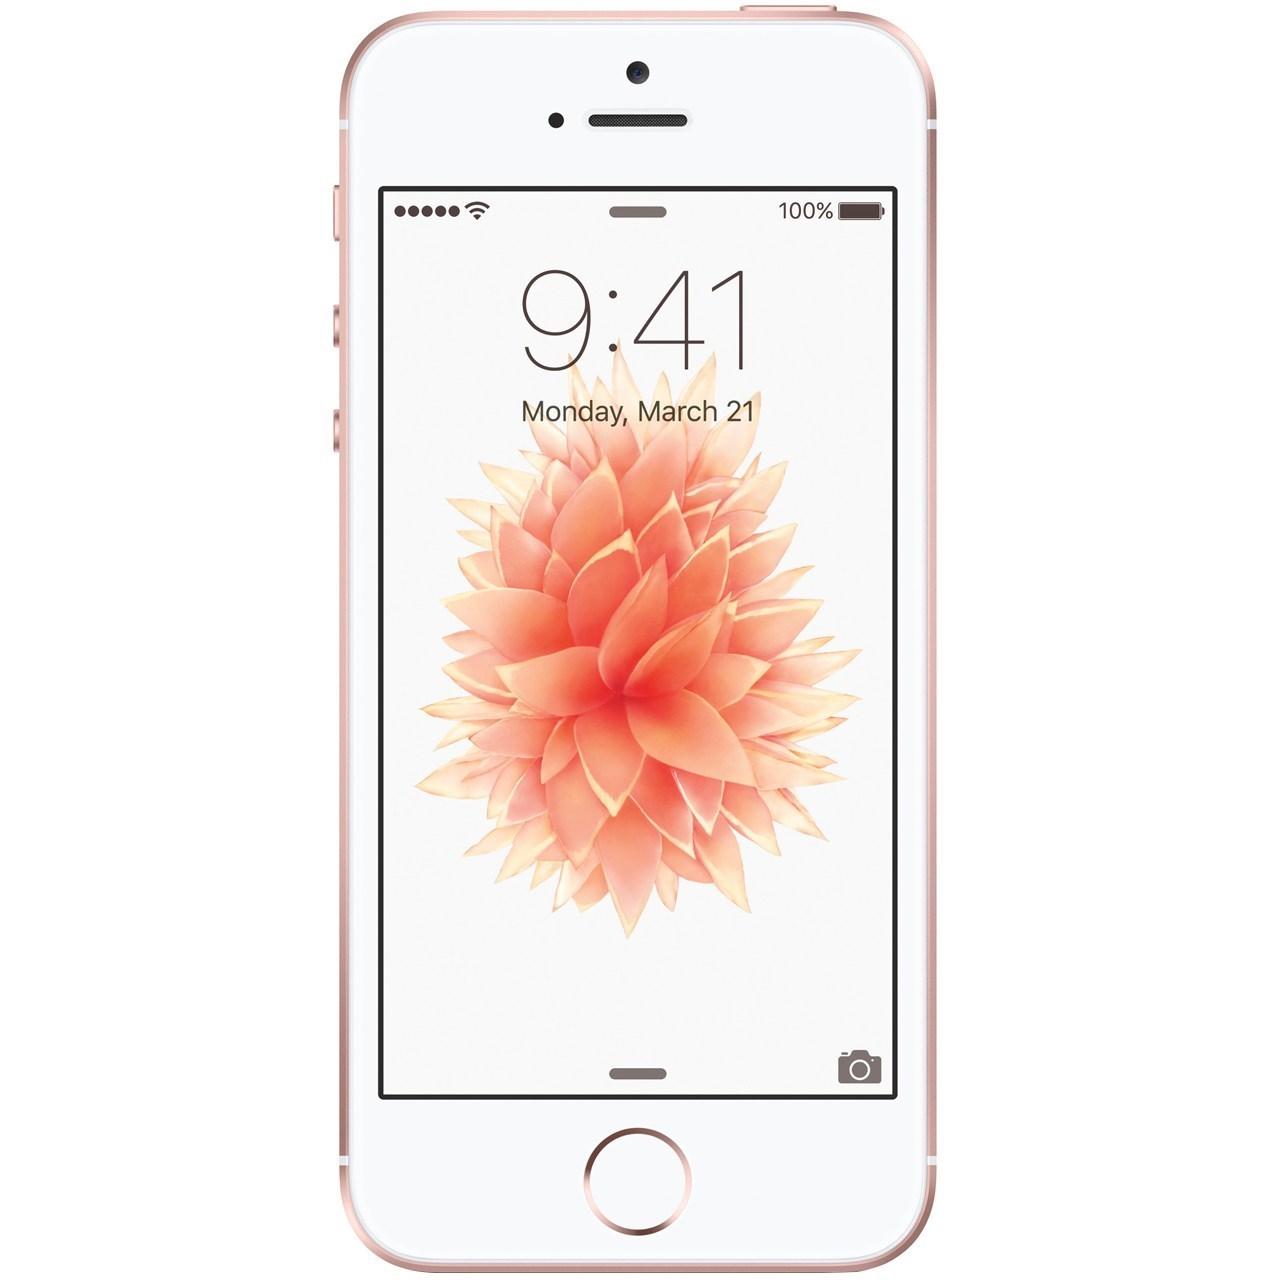 گوشی موبایل اپل مدل iPhone SE ظرفیت 32 گیگابایت | Apple iPhone SE 32GB Mobile Phone